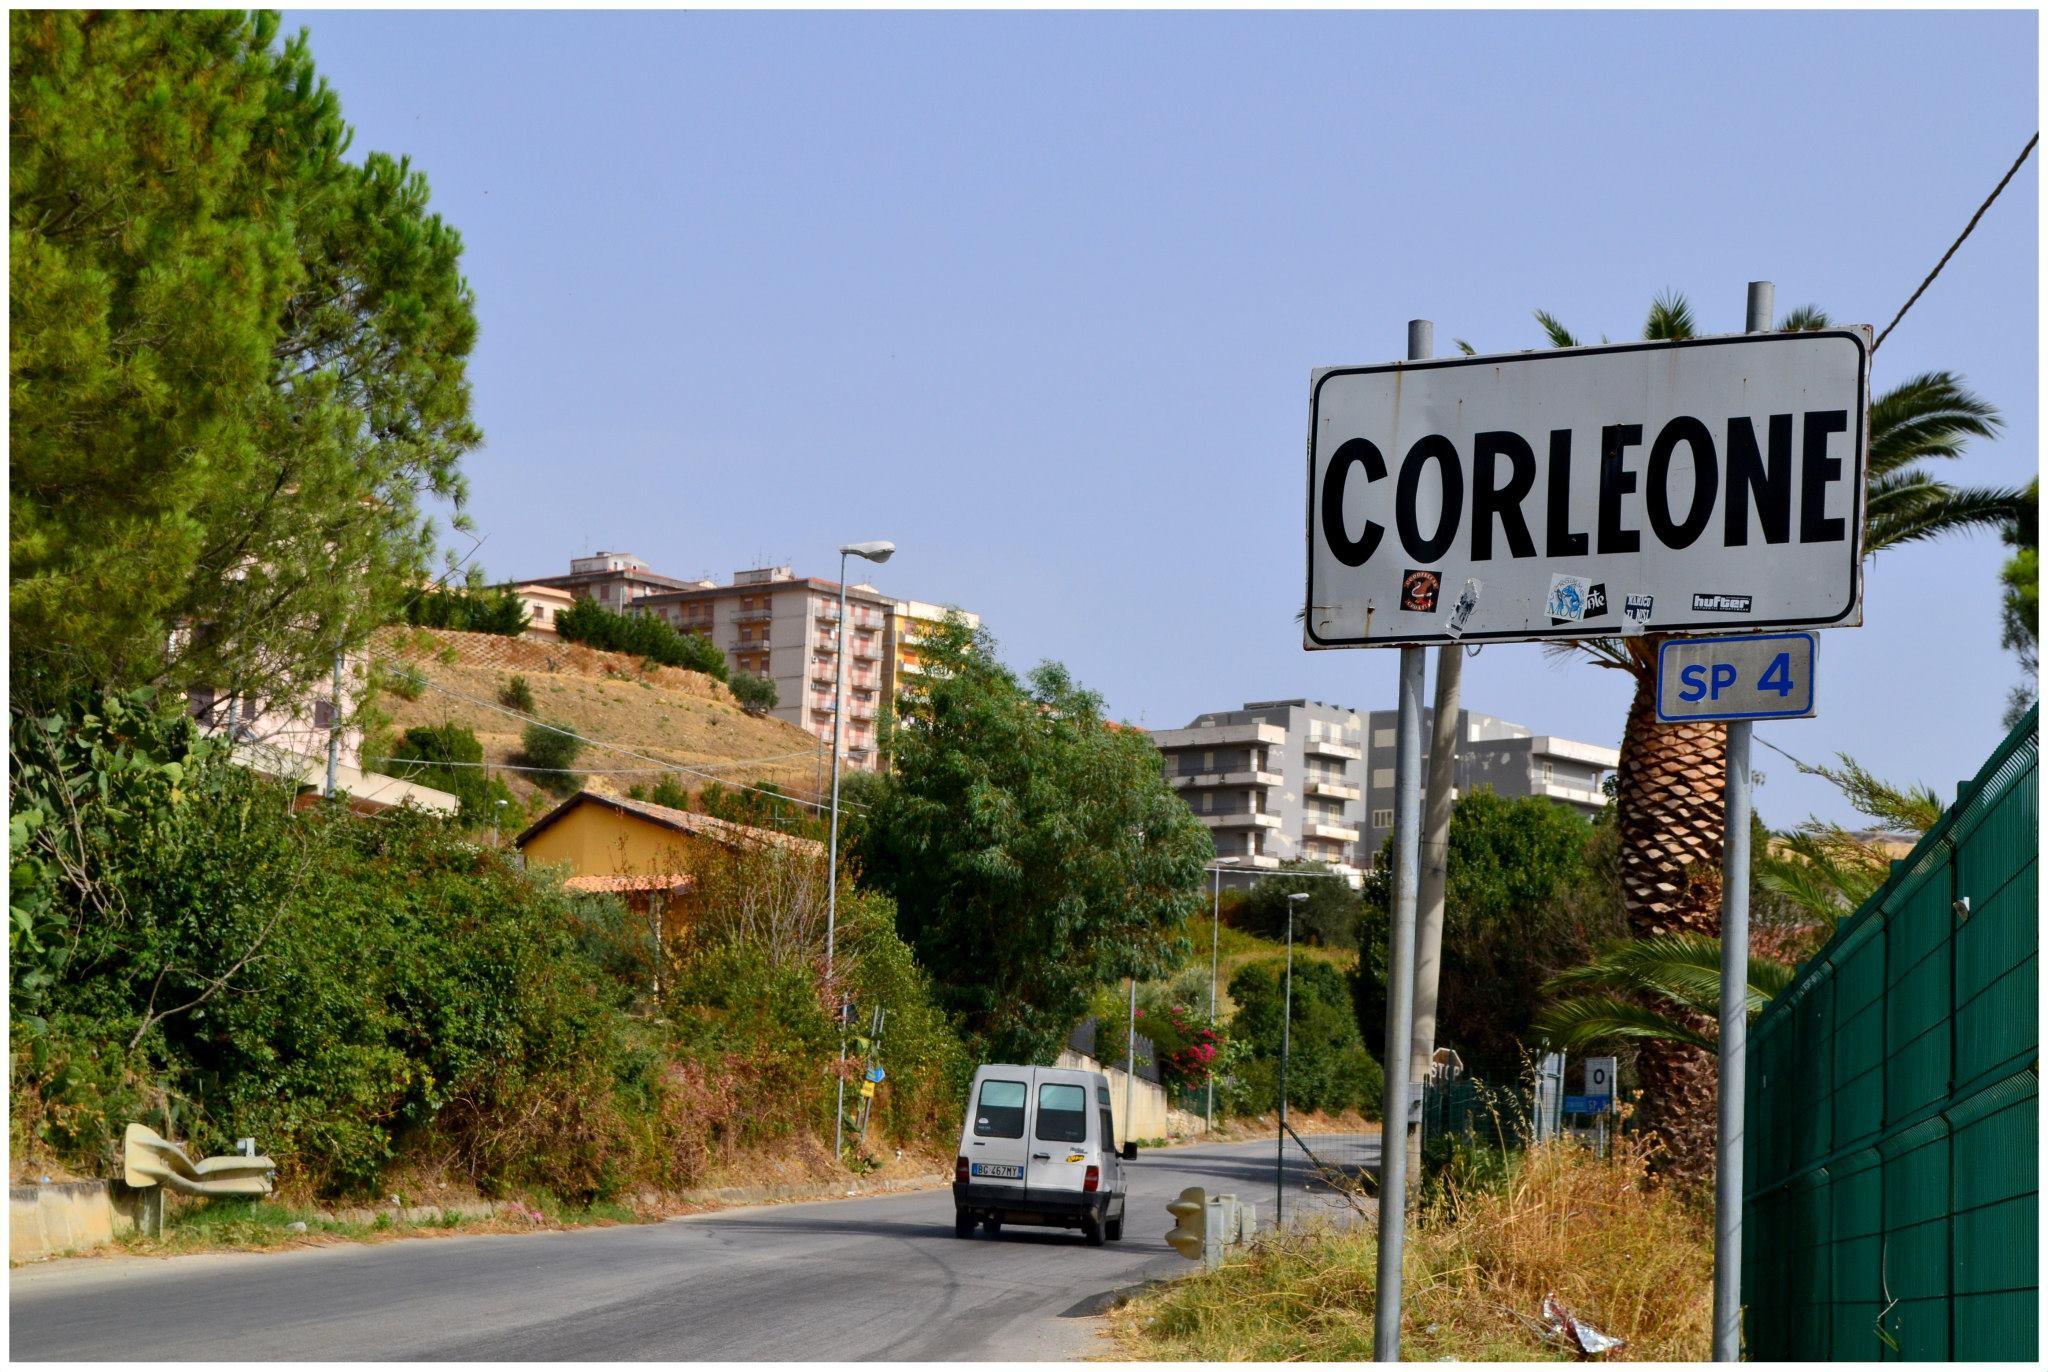 Corleone caput mundi.